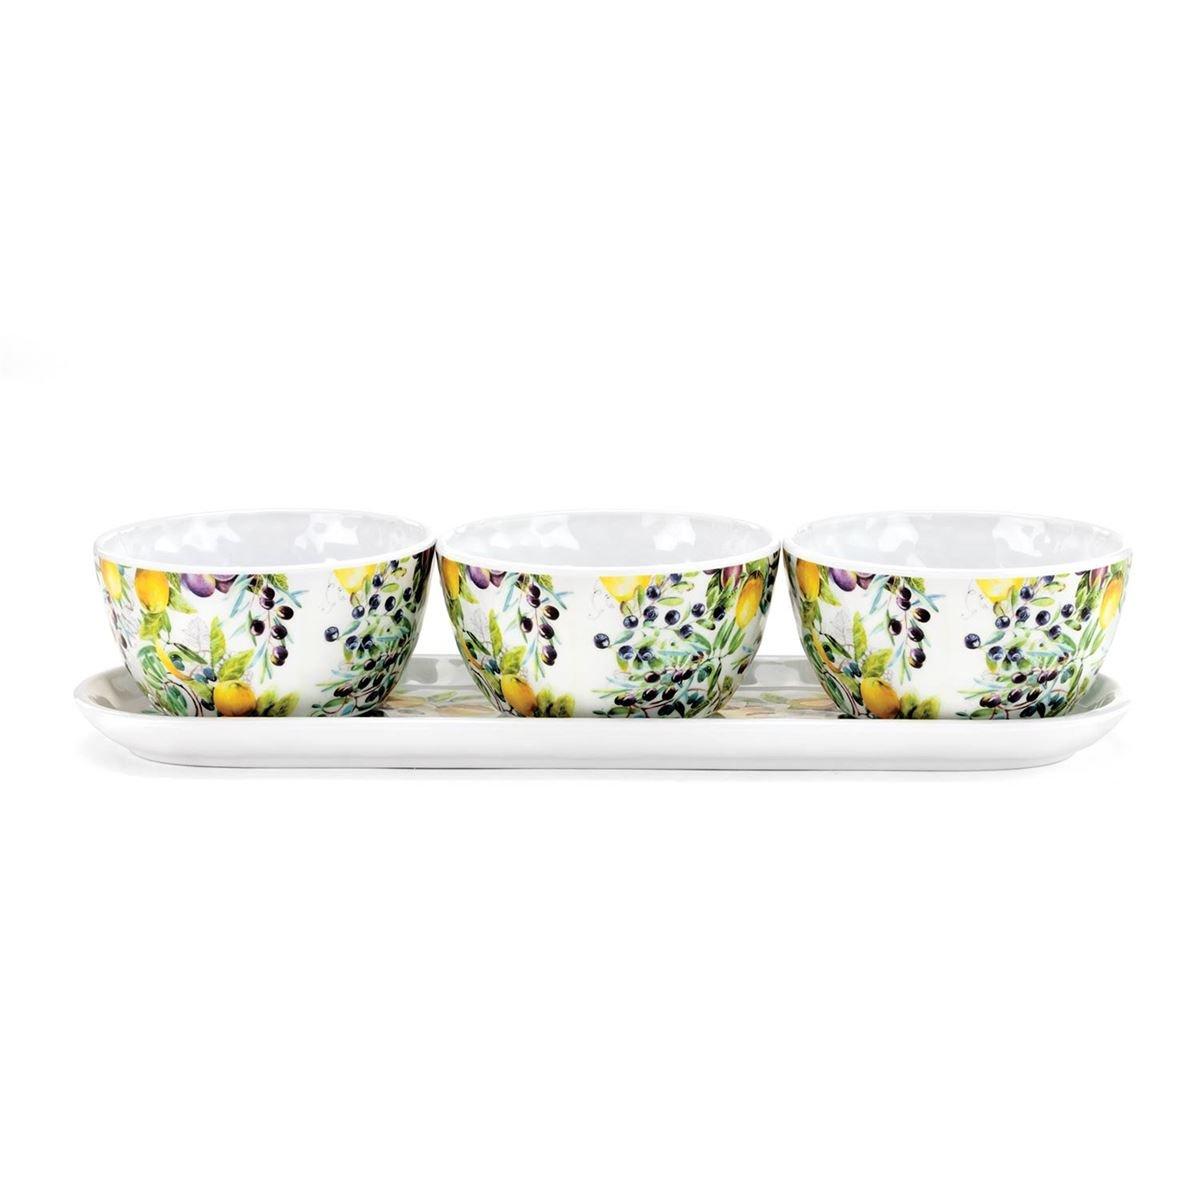 Ho Ho Ho Michel Design Works Melamine Serveware Condiment Set